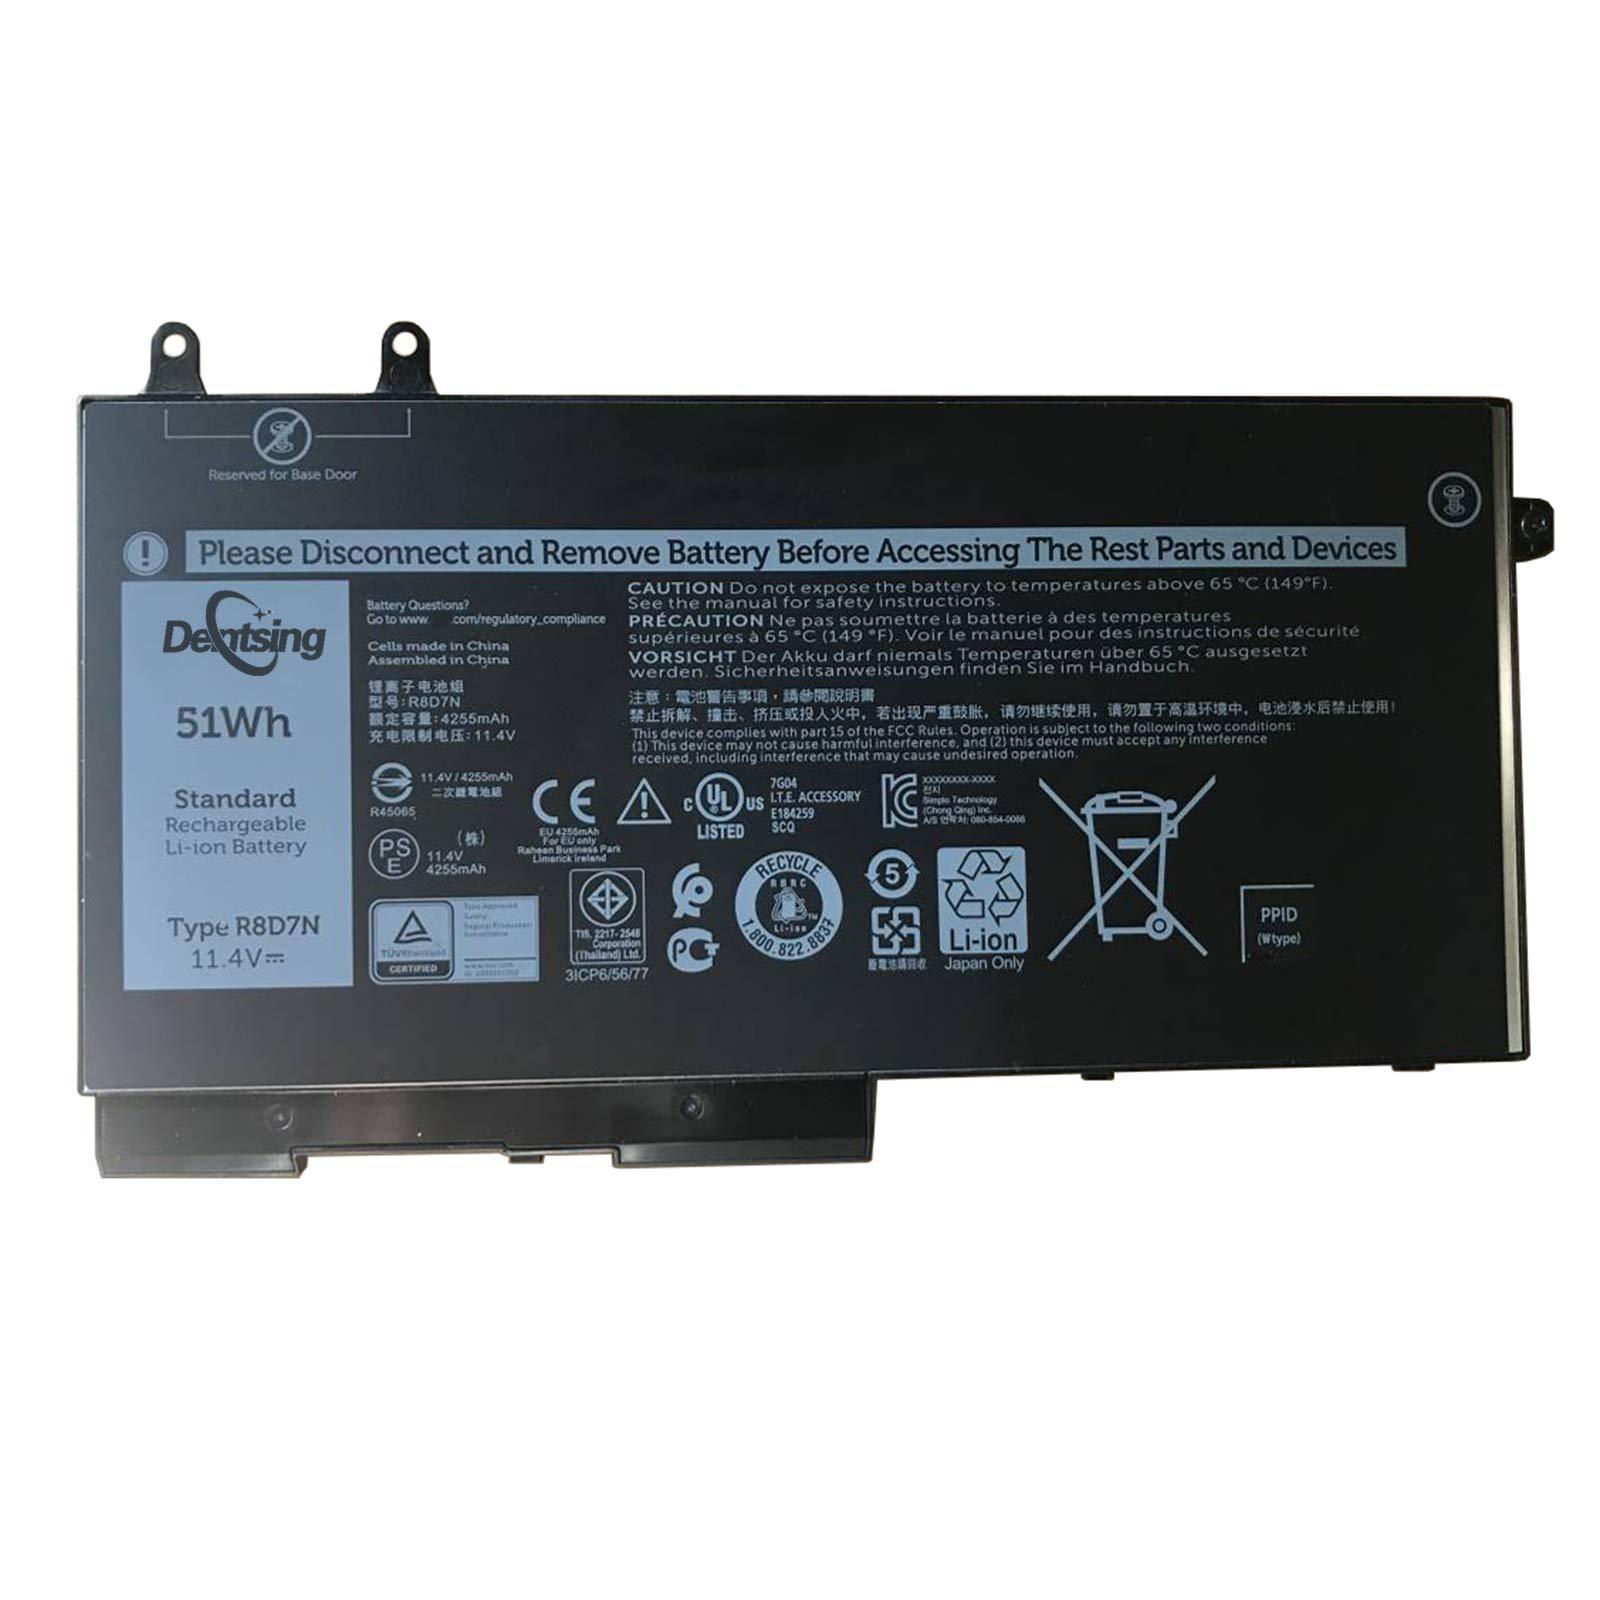 Bateria R8D7N para Dell Precision 3540 M3550 Latitude 5400 5